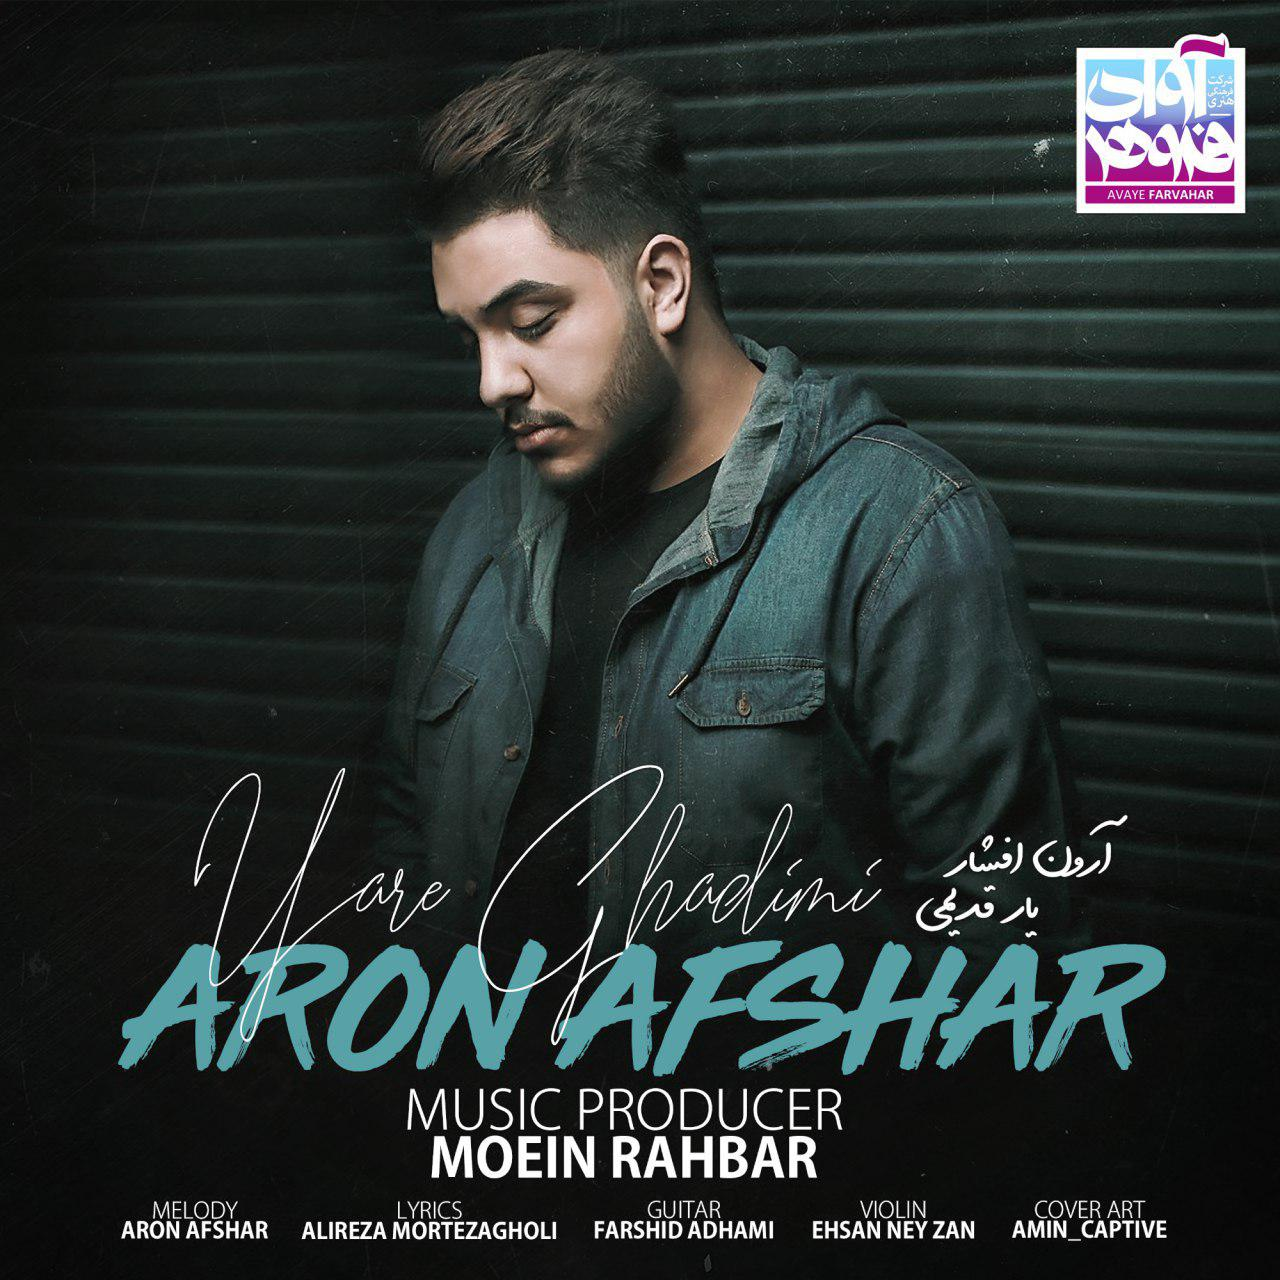 https://www.ganja2music.com/Image/Post/8.2019/Aron%20Afshar%20-%20Yare%20Ghadimi.jpg